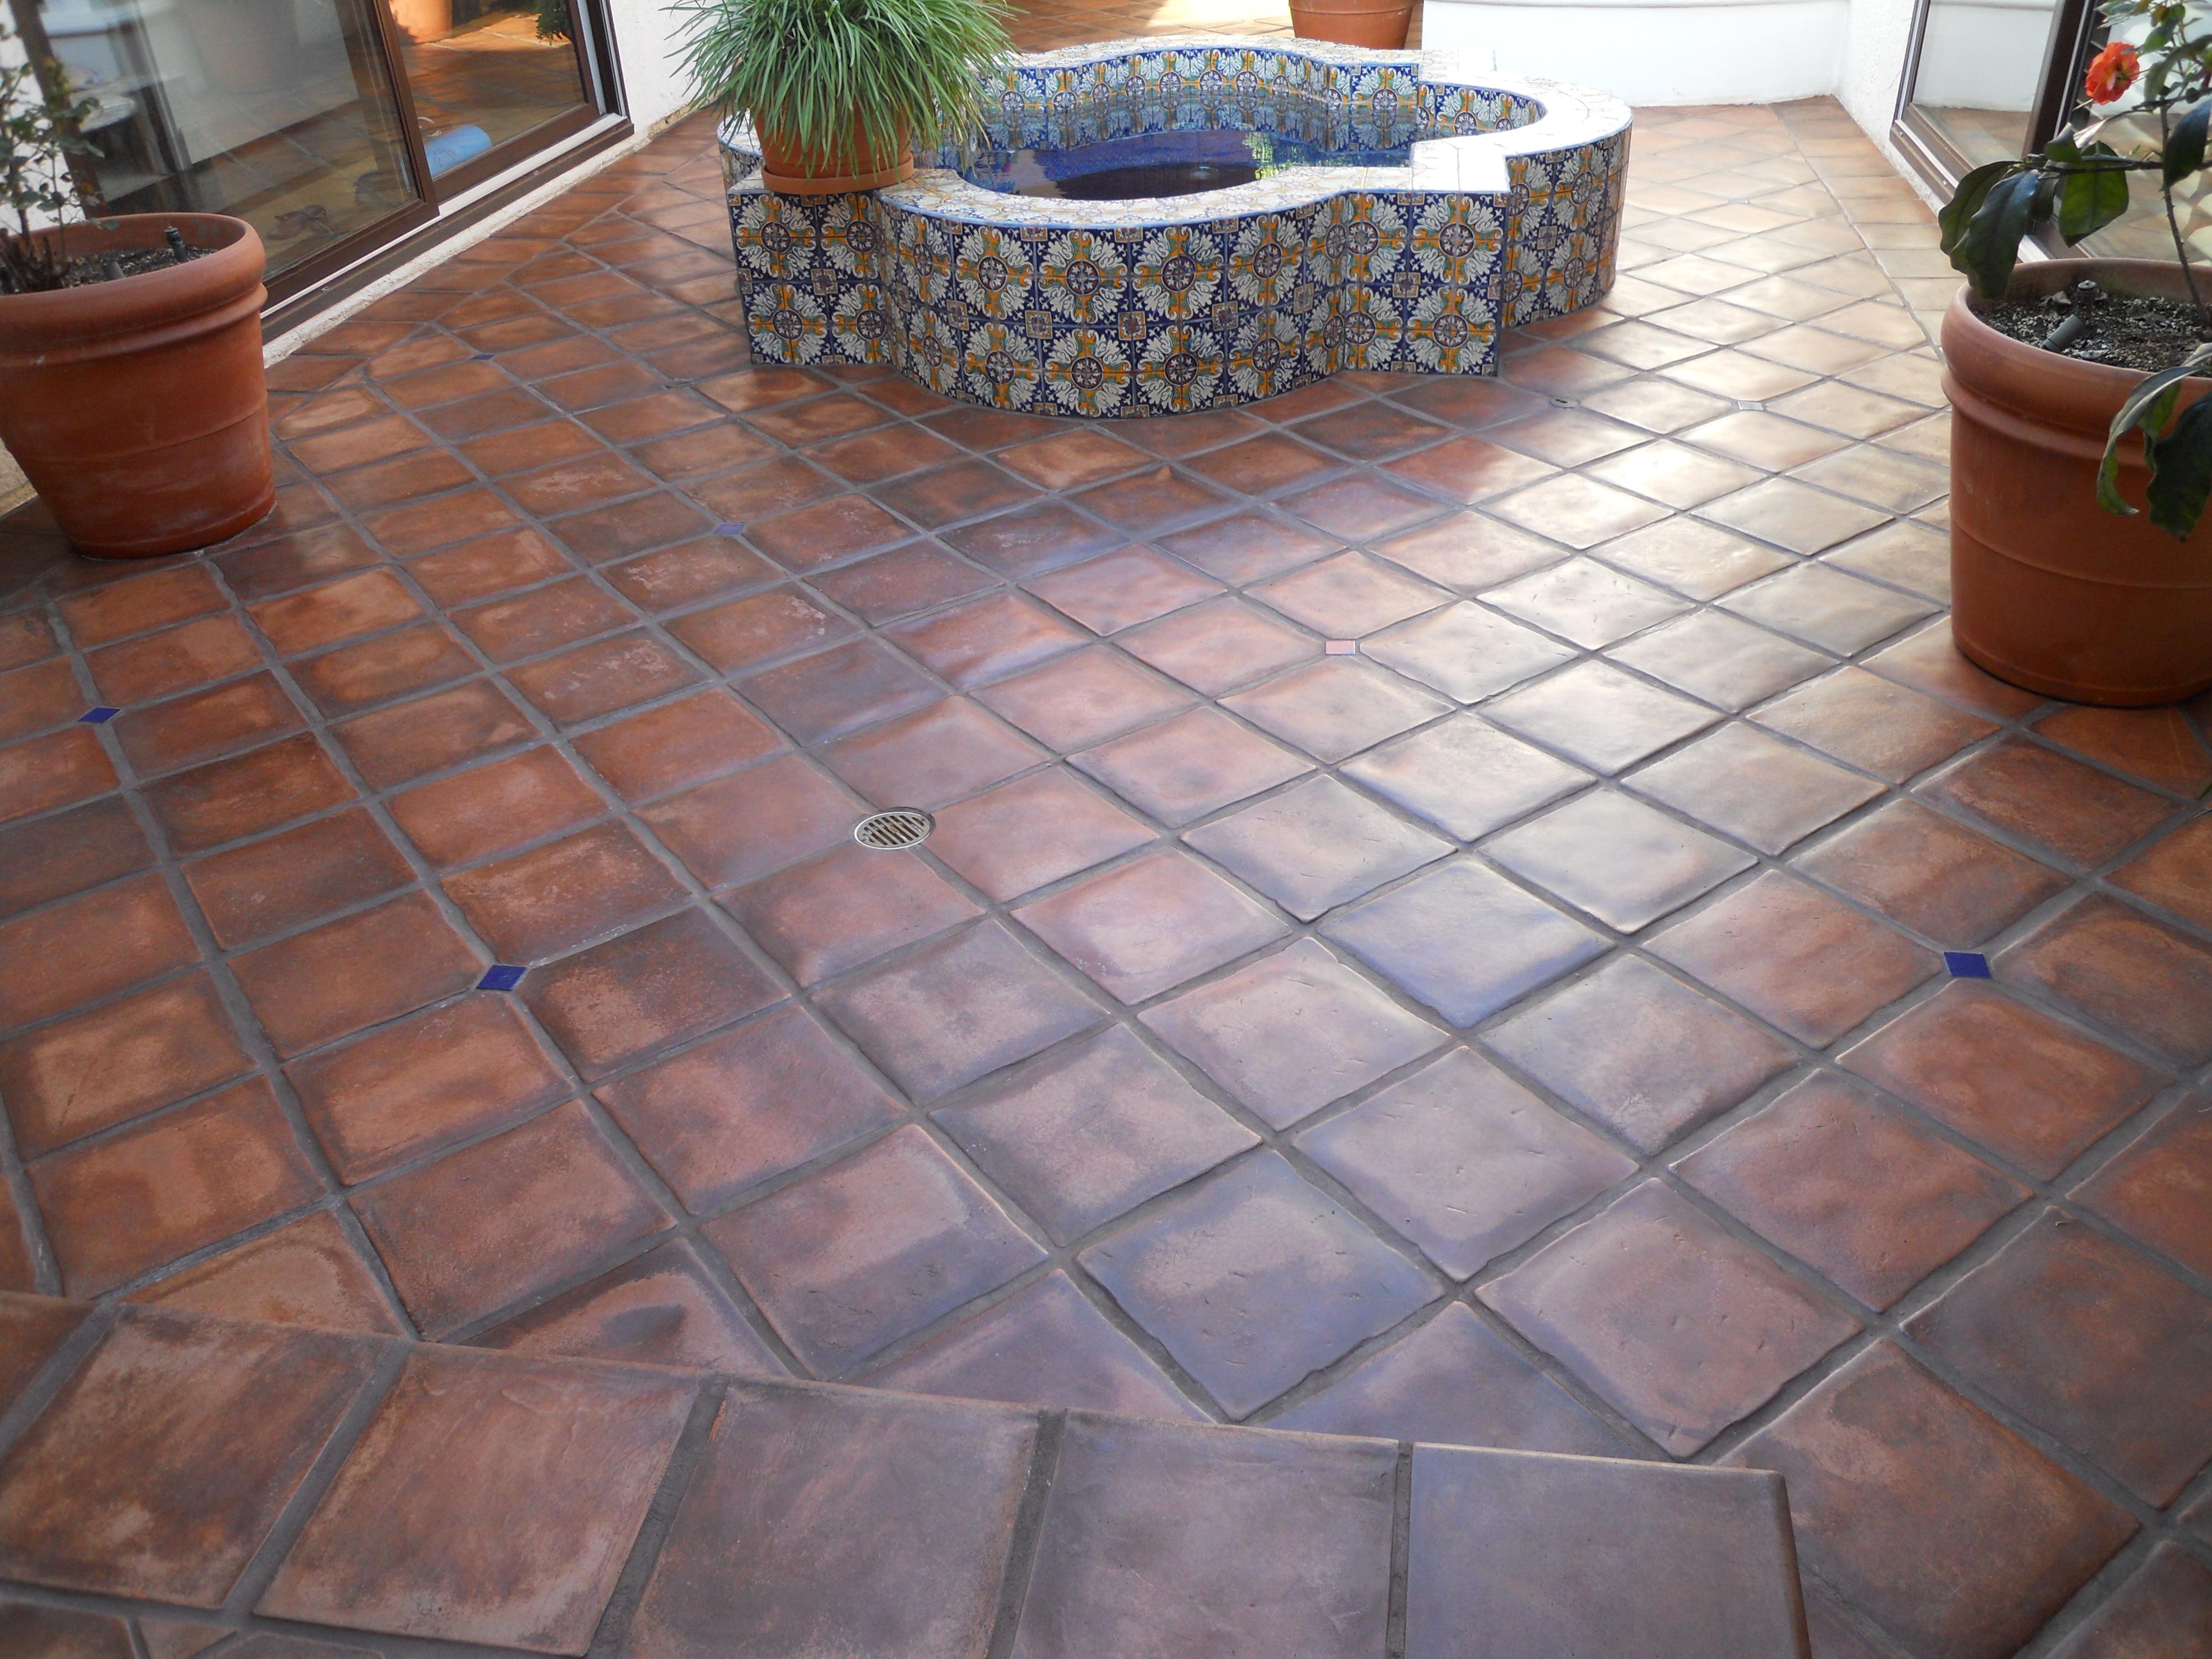 Water Damagecalifornia Tile Sealers California Tile Sealers